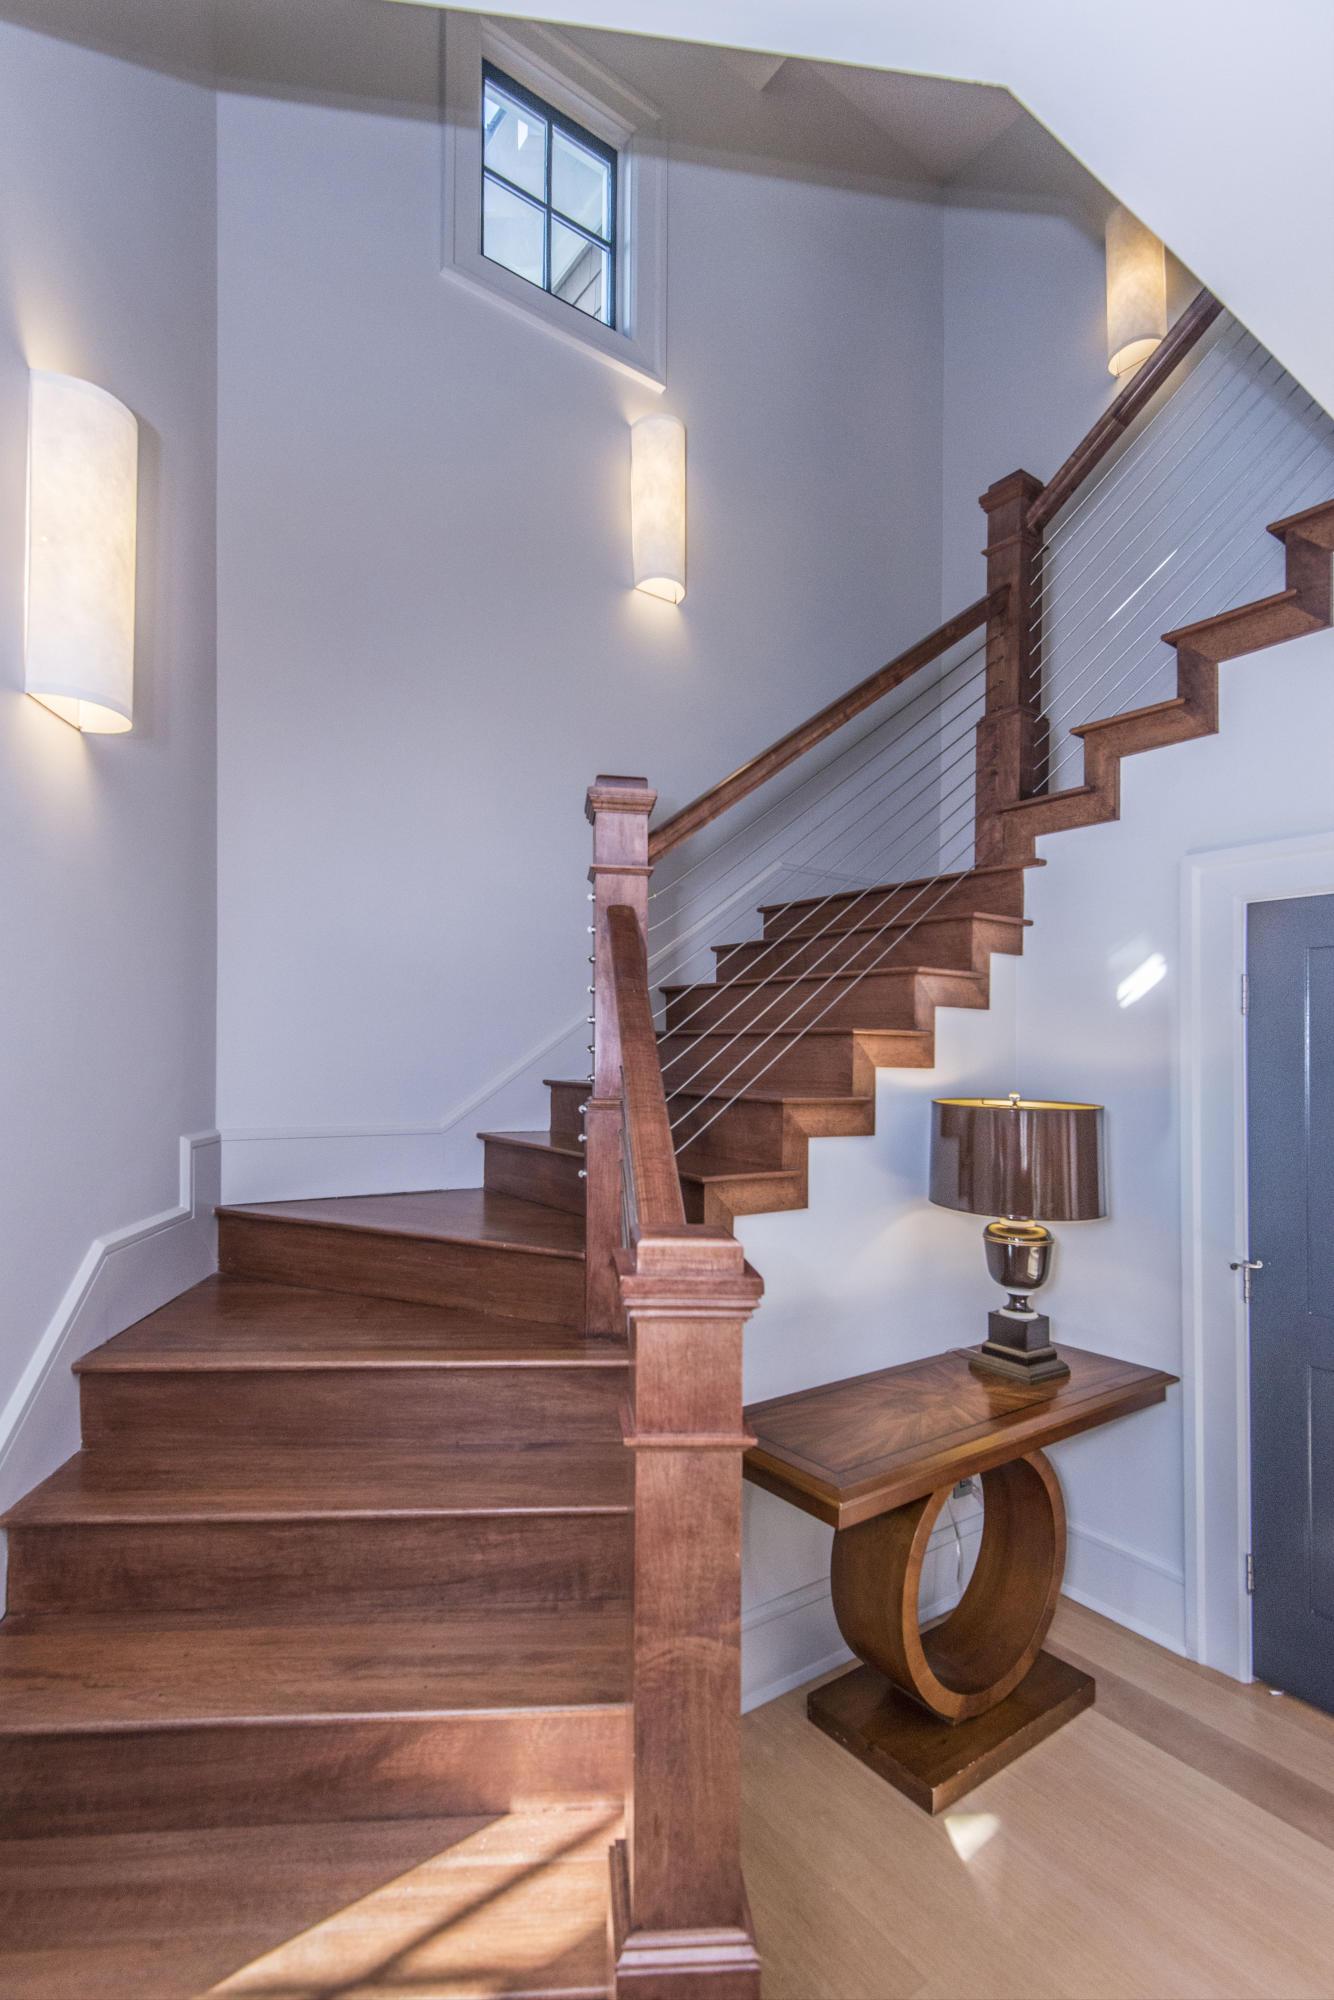 Saltgrass Pointe Homes For Sale - 916 Mciver, Mount Pleasant, SC - 28